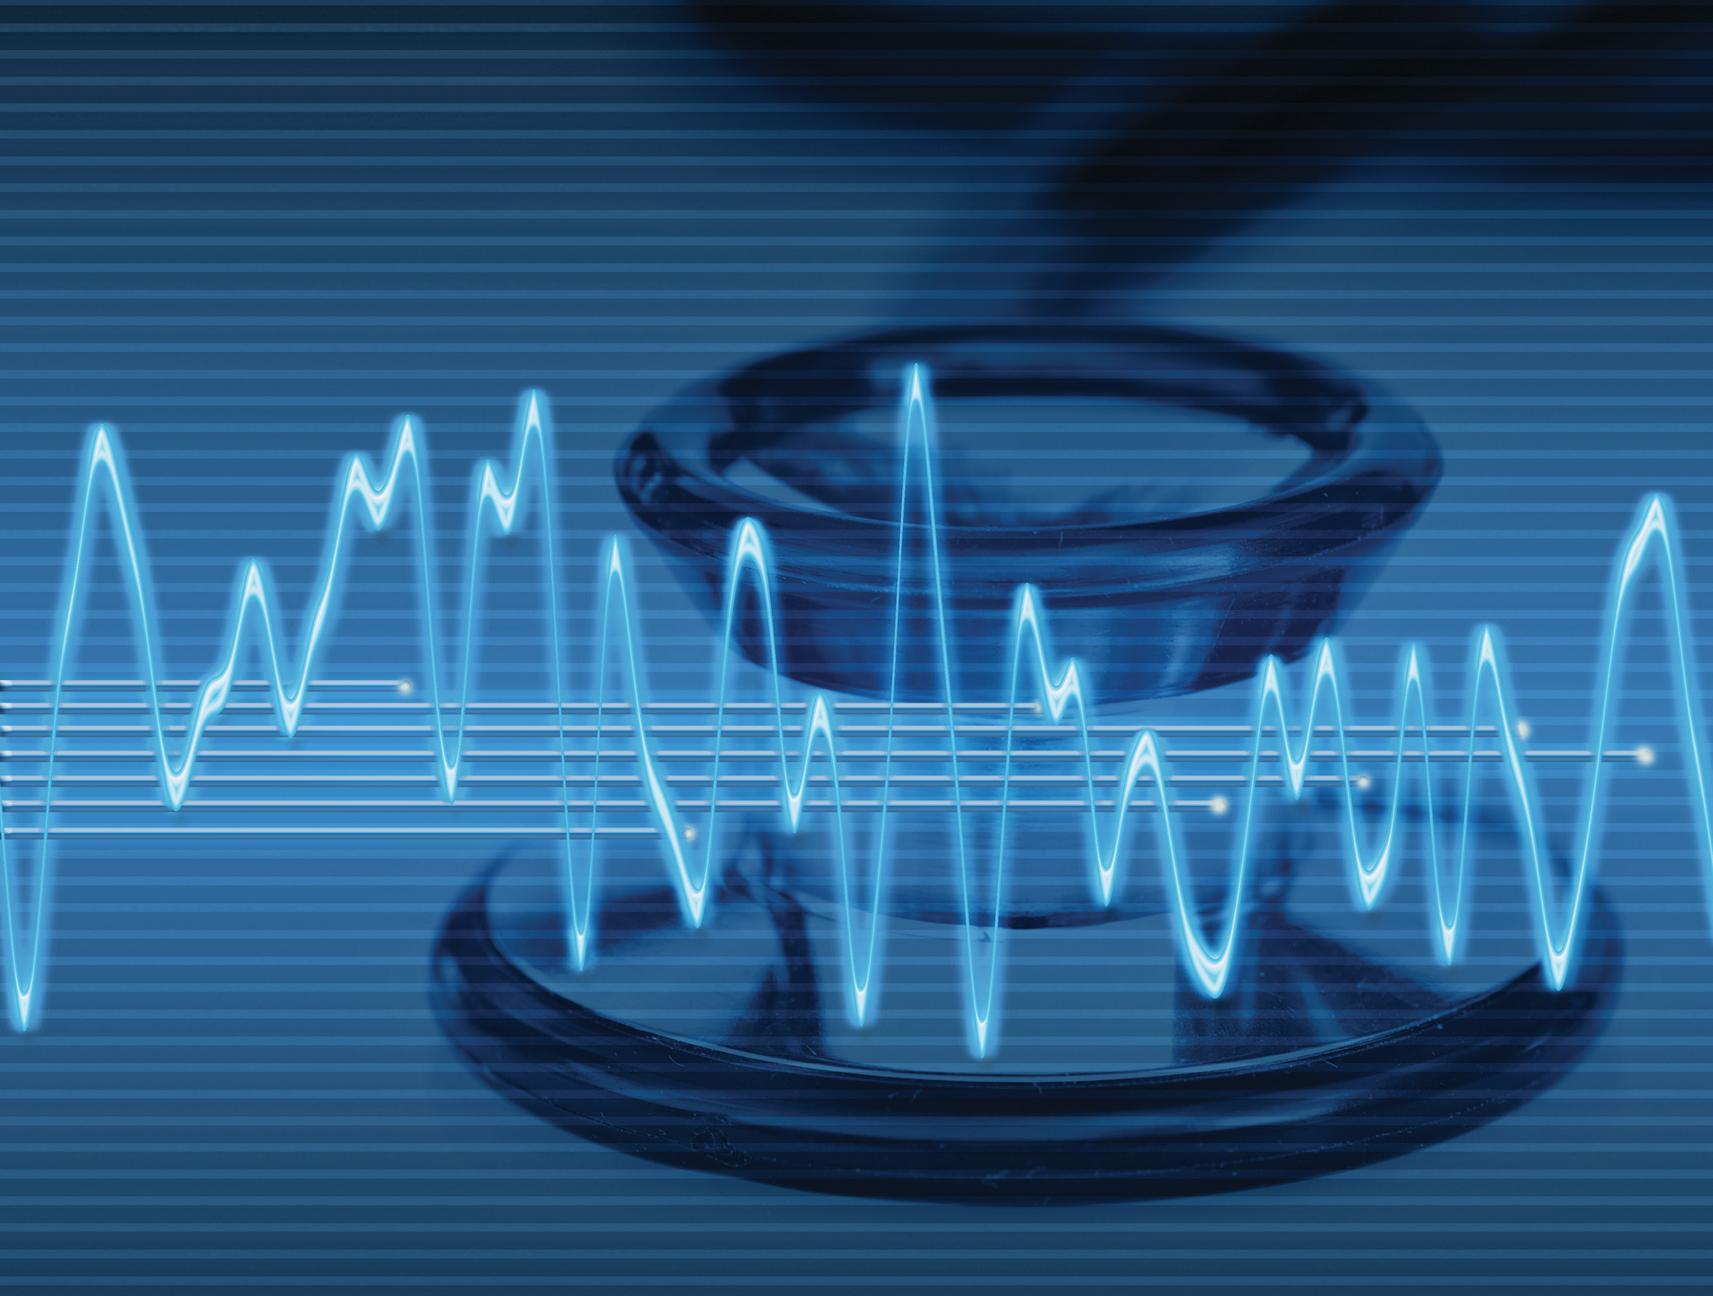 HealthCare-Px_Medical-dreamstime_5569648